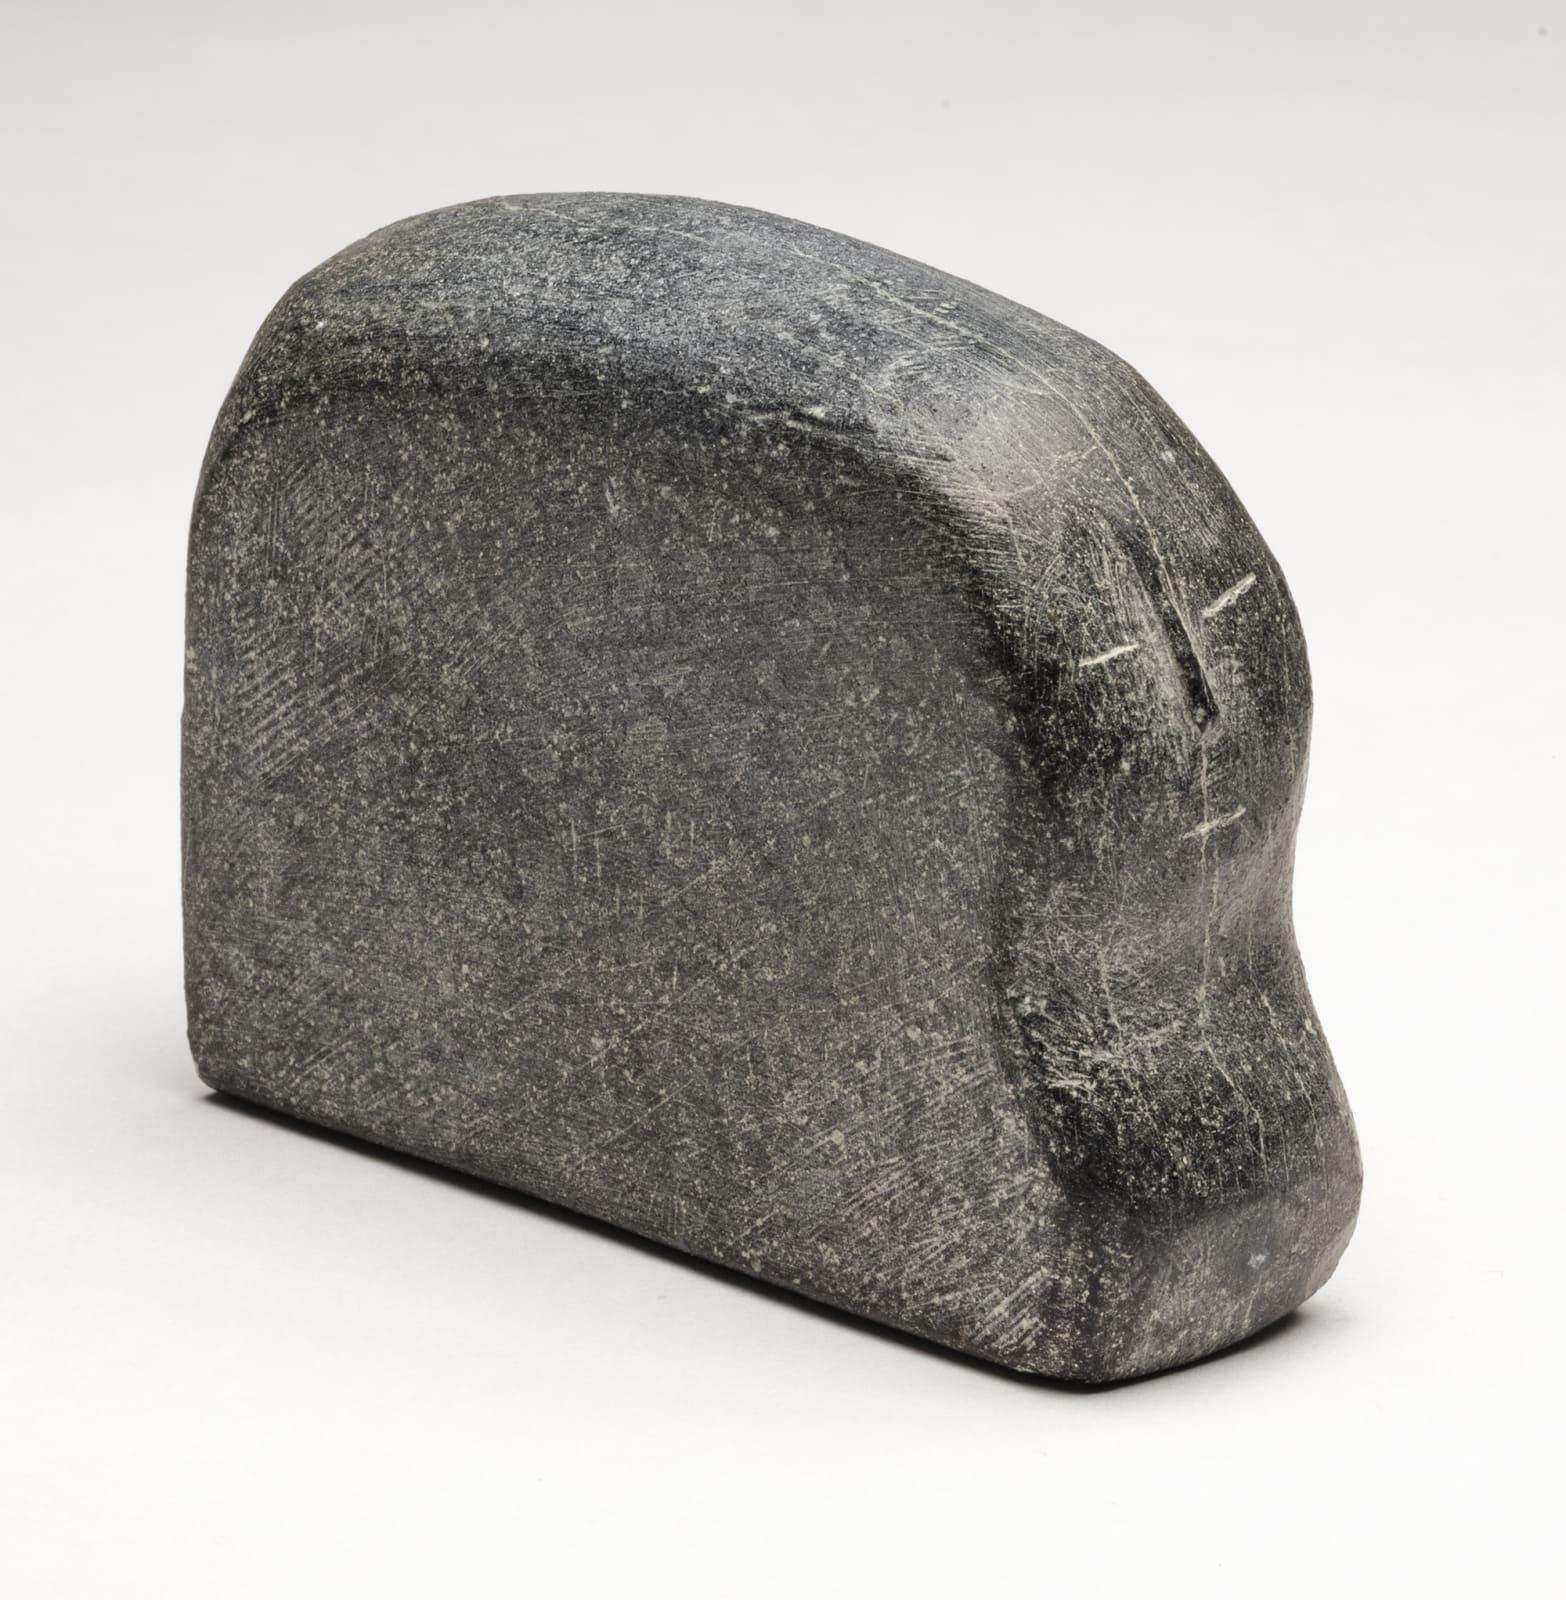 JOHN PANGNARK (1920-1980) ARVIAT (ESKIMO POINT), Figure, c. 1970-73